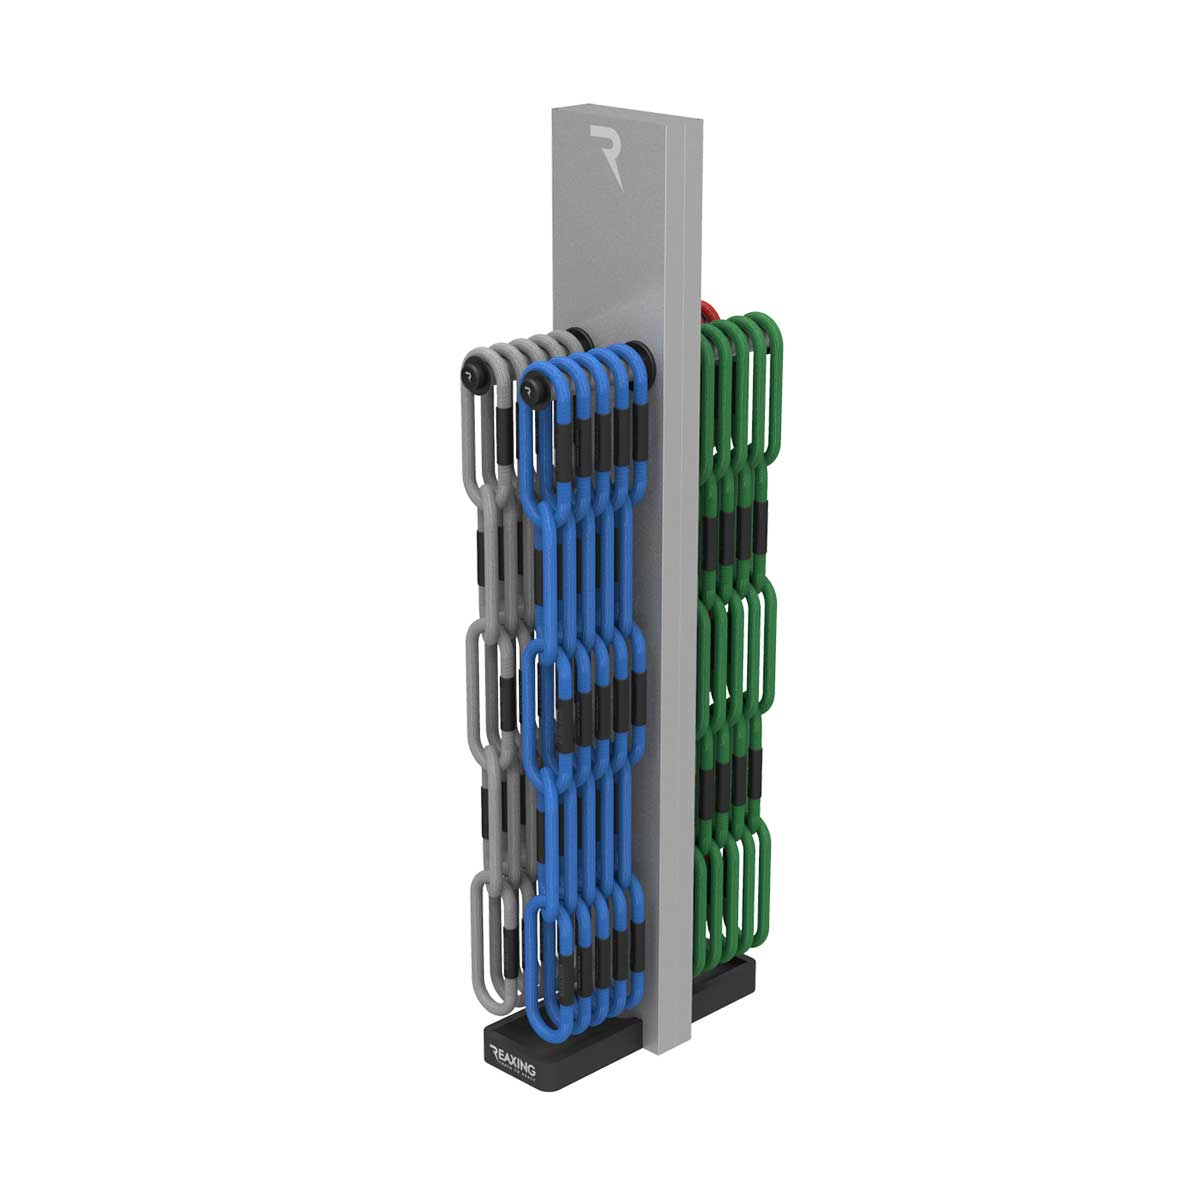 reax-chain-5-stojak do lancuchow funkcjonalnych reaxing